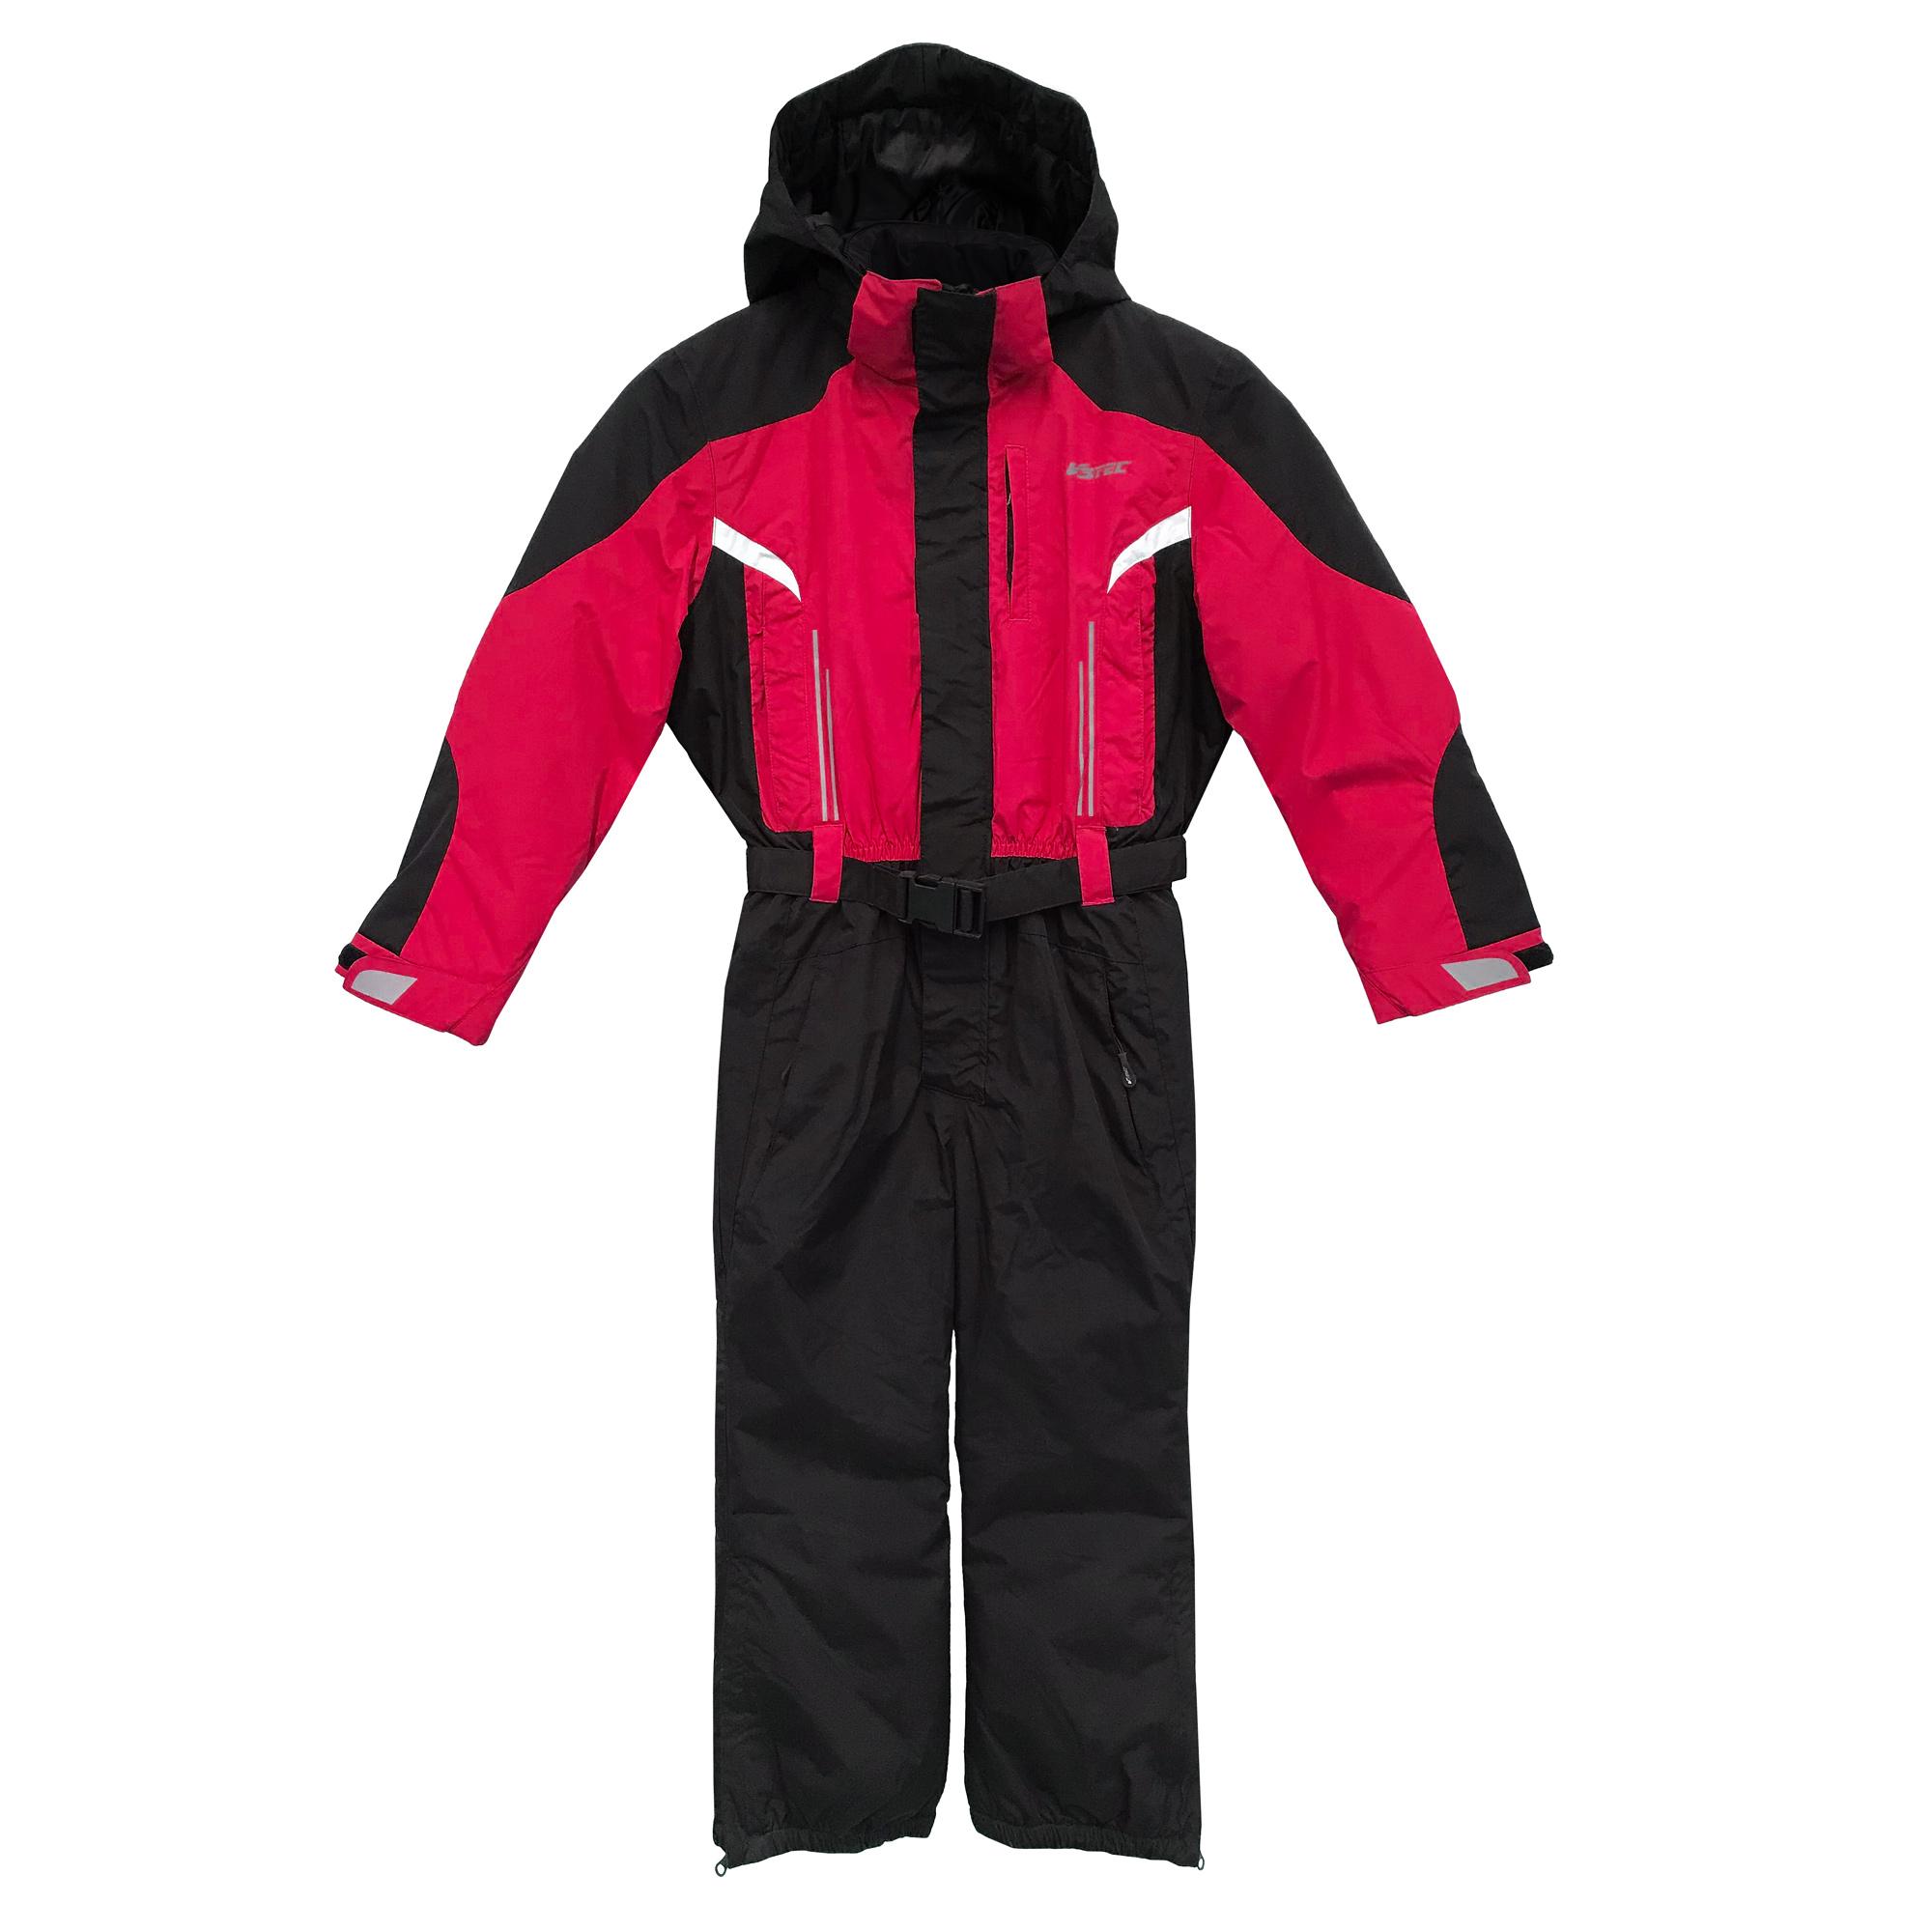 V3Tec Parsel Kinder Skioverall Schneeanzug – 117568-3016 – rot/schwarz